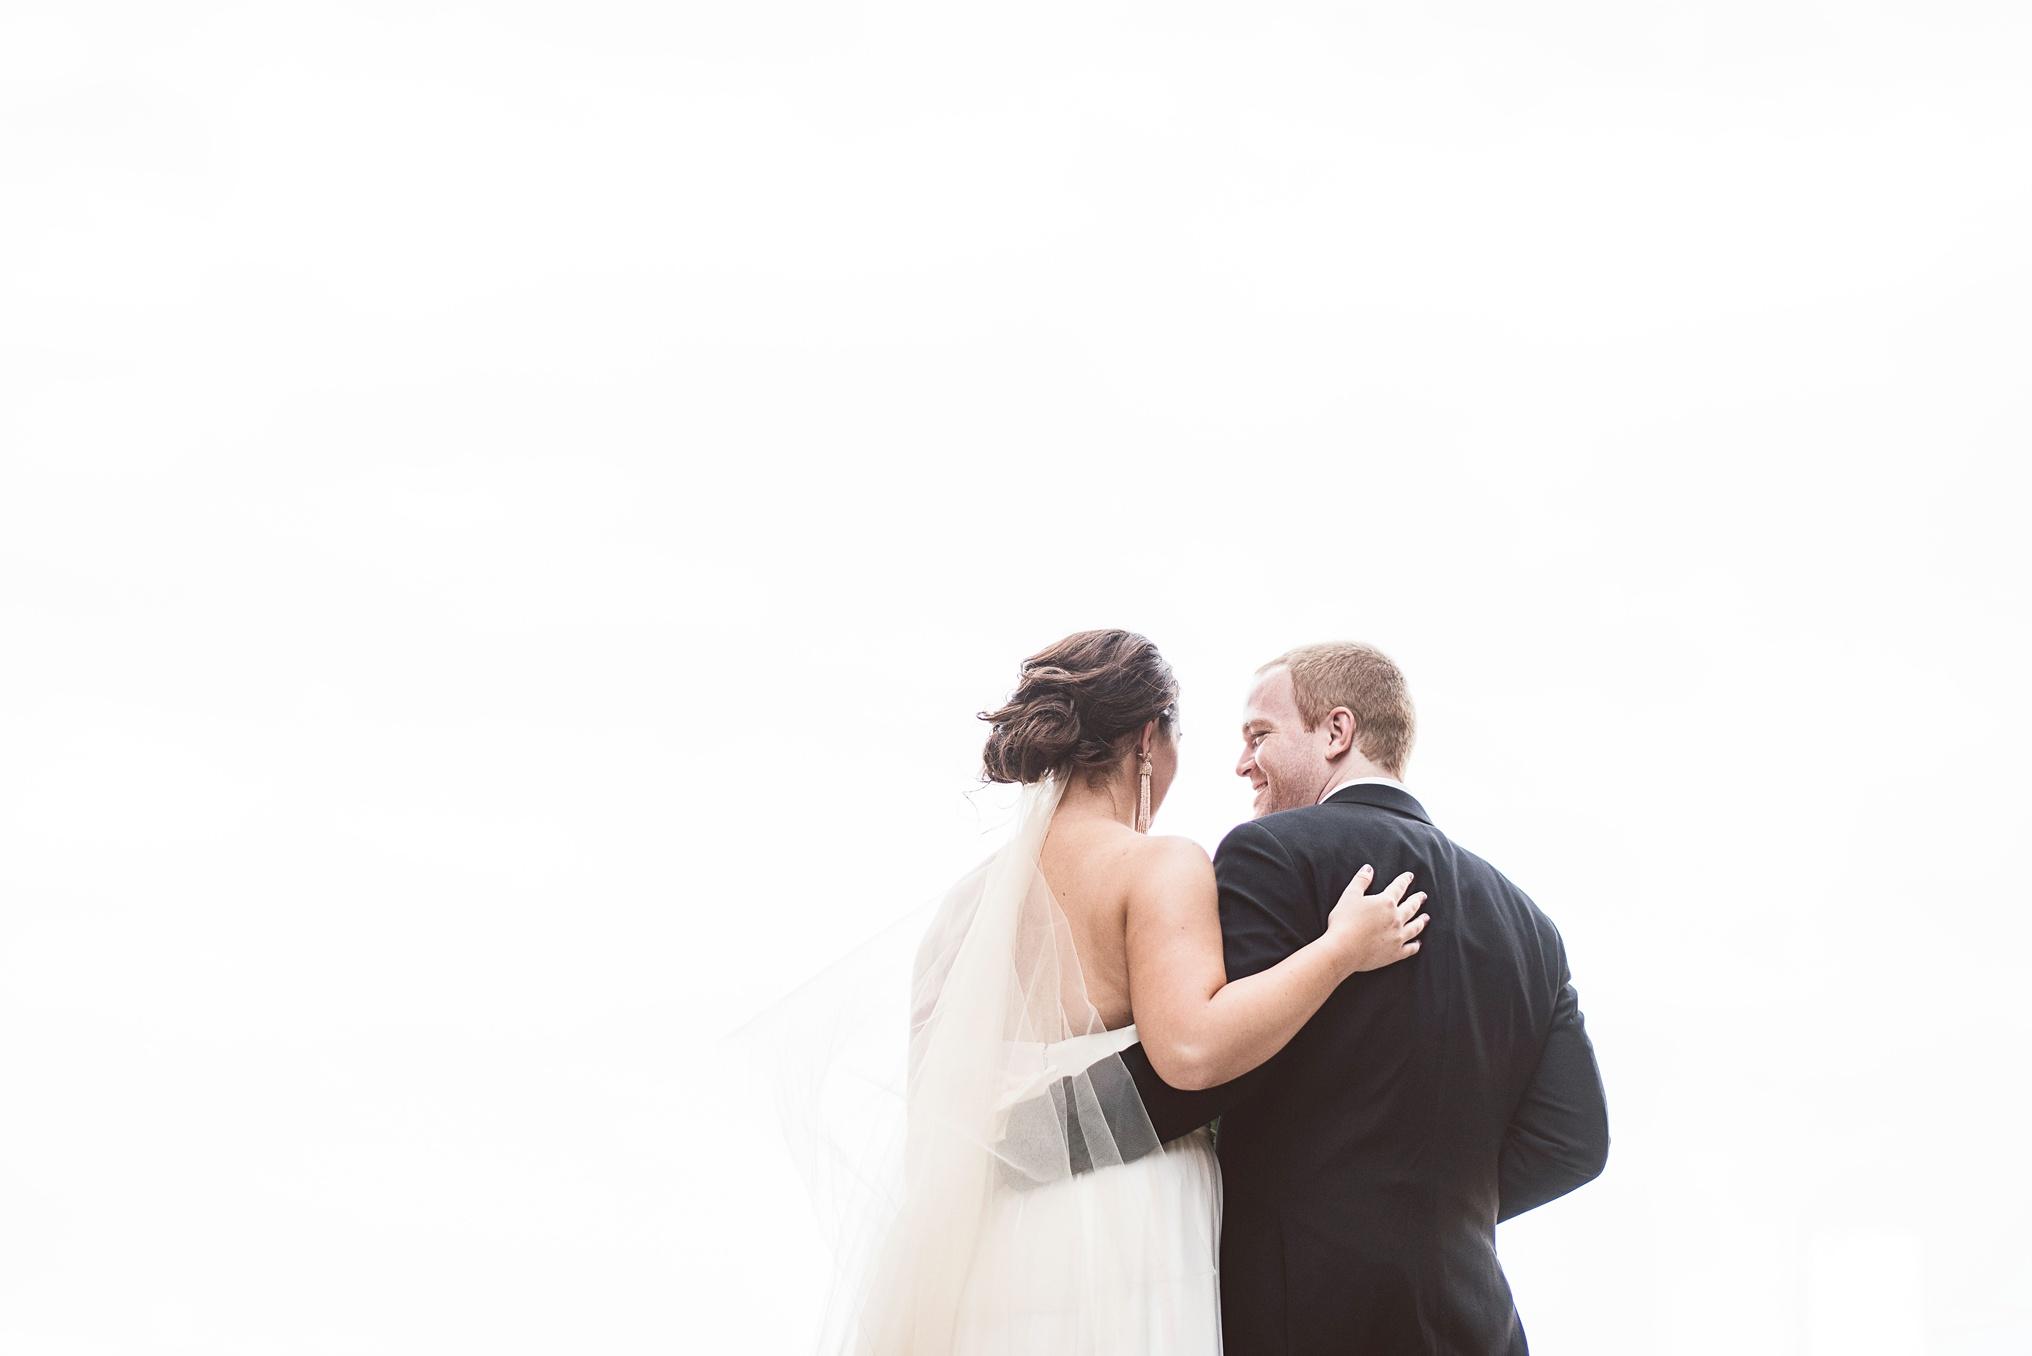 best_wedding_photography_2017_by_lucas_botz_photography_052.jpg